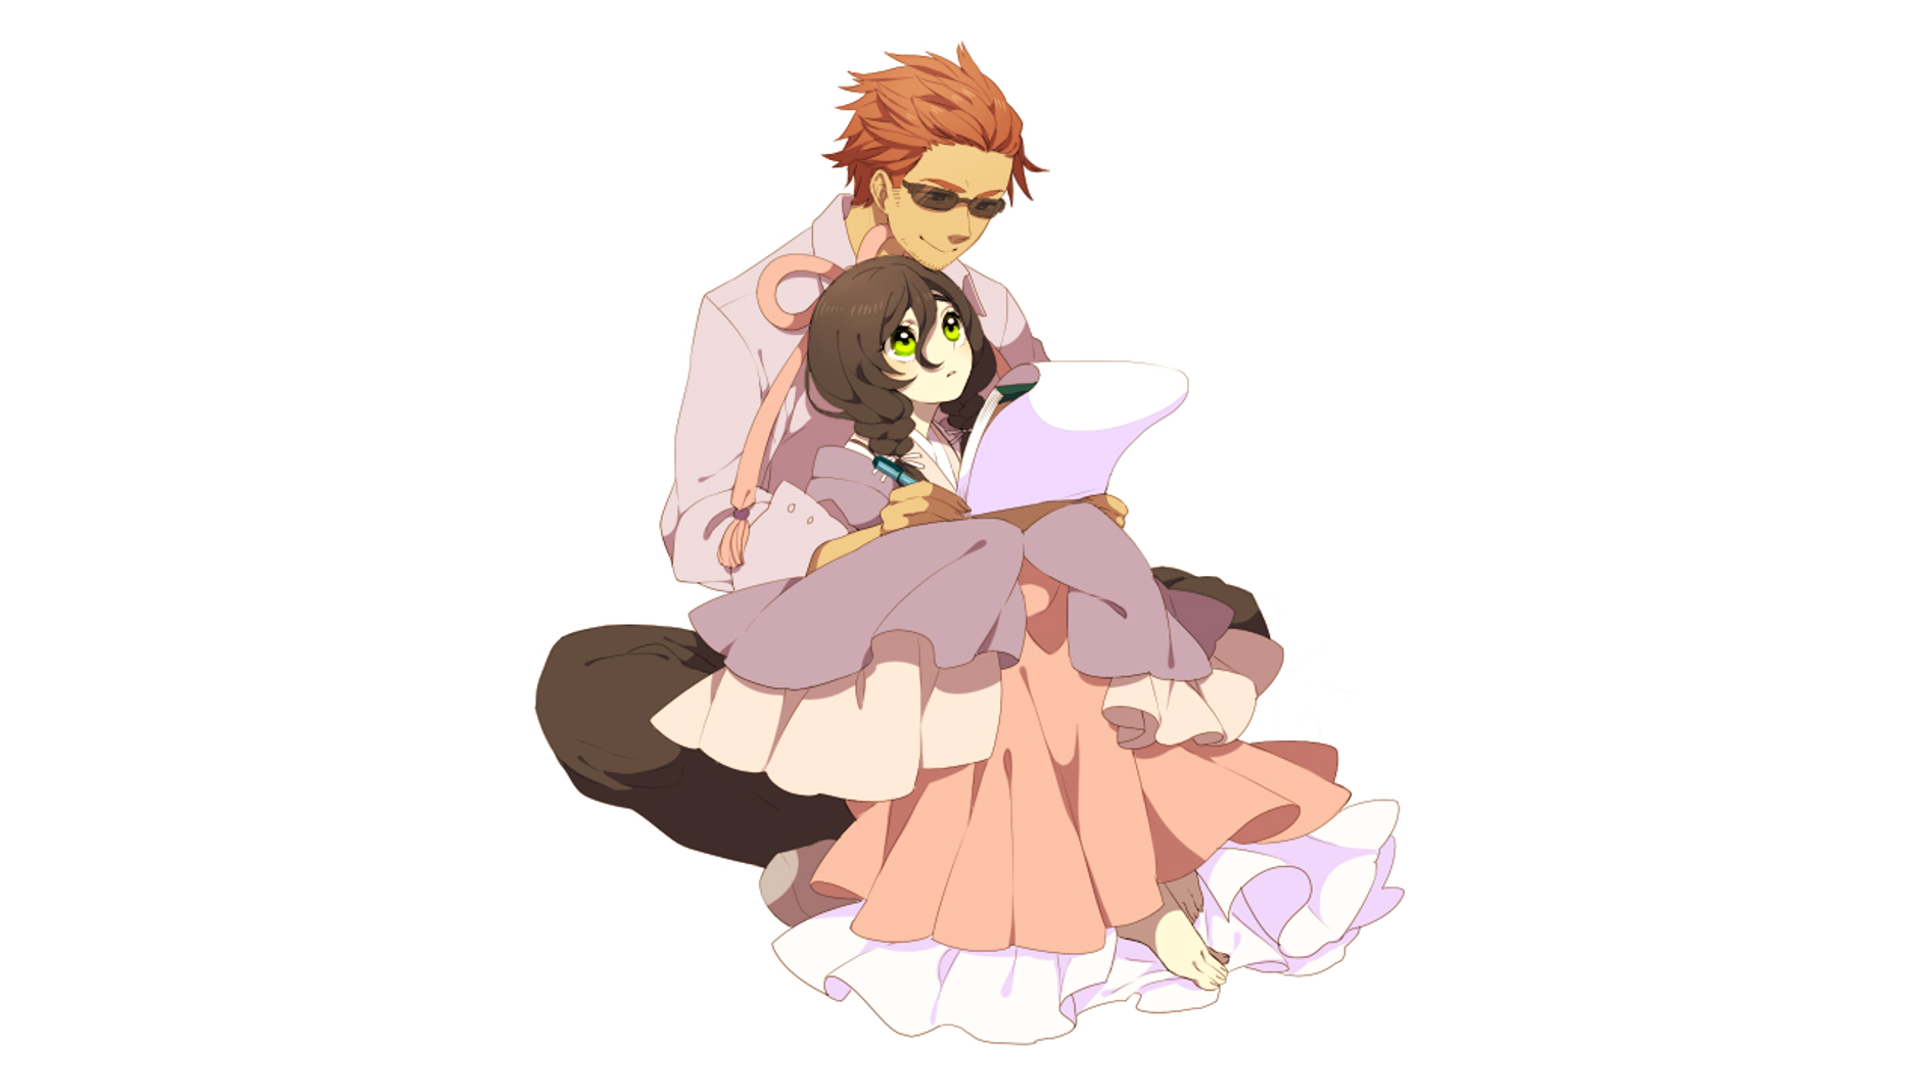 Anime Girl Anime Boy Hd Wallpaper Background Image 1920x1080